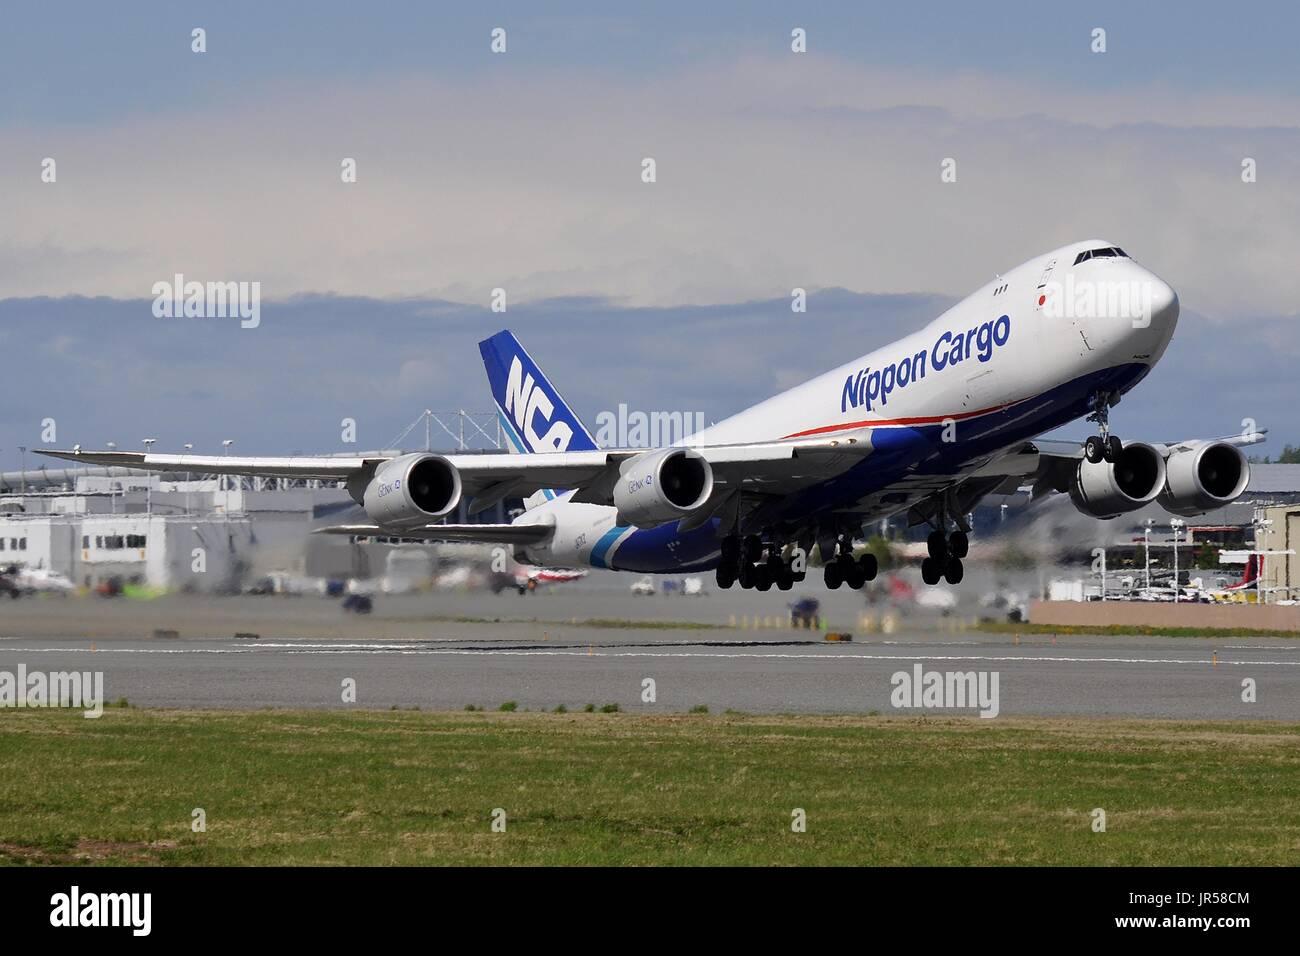 NIPPON CARGO AIRLINES BOEING 747-8F JA17KZ - Stock Image